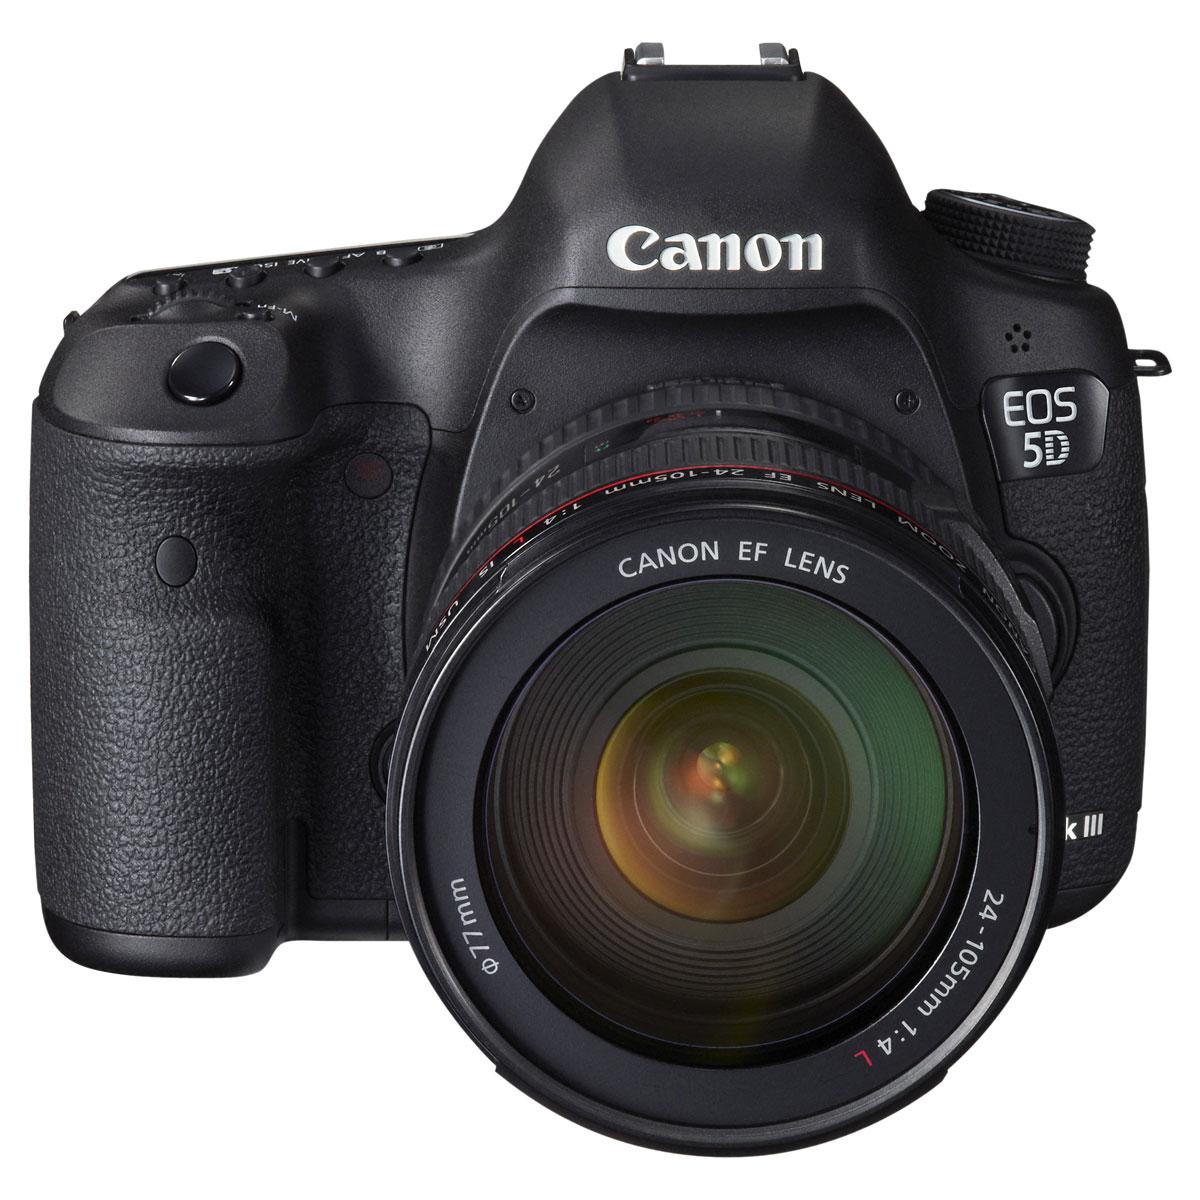 canon eos 5d mark iii objectif 24 105 mm appareil photo reflex canon sur. Black Bedroom Furniture Sets. Home Design Ideas